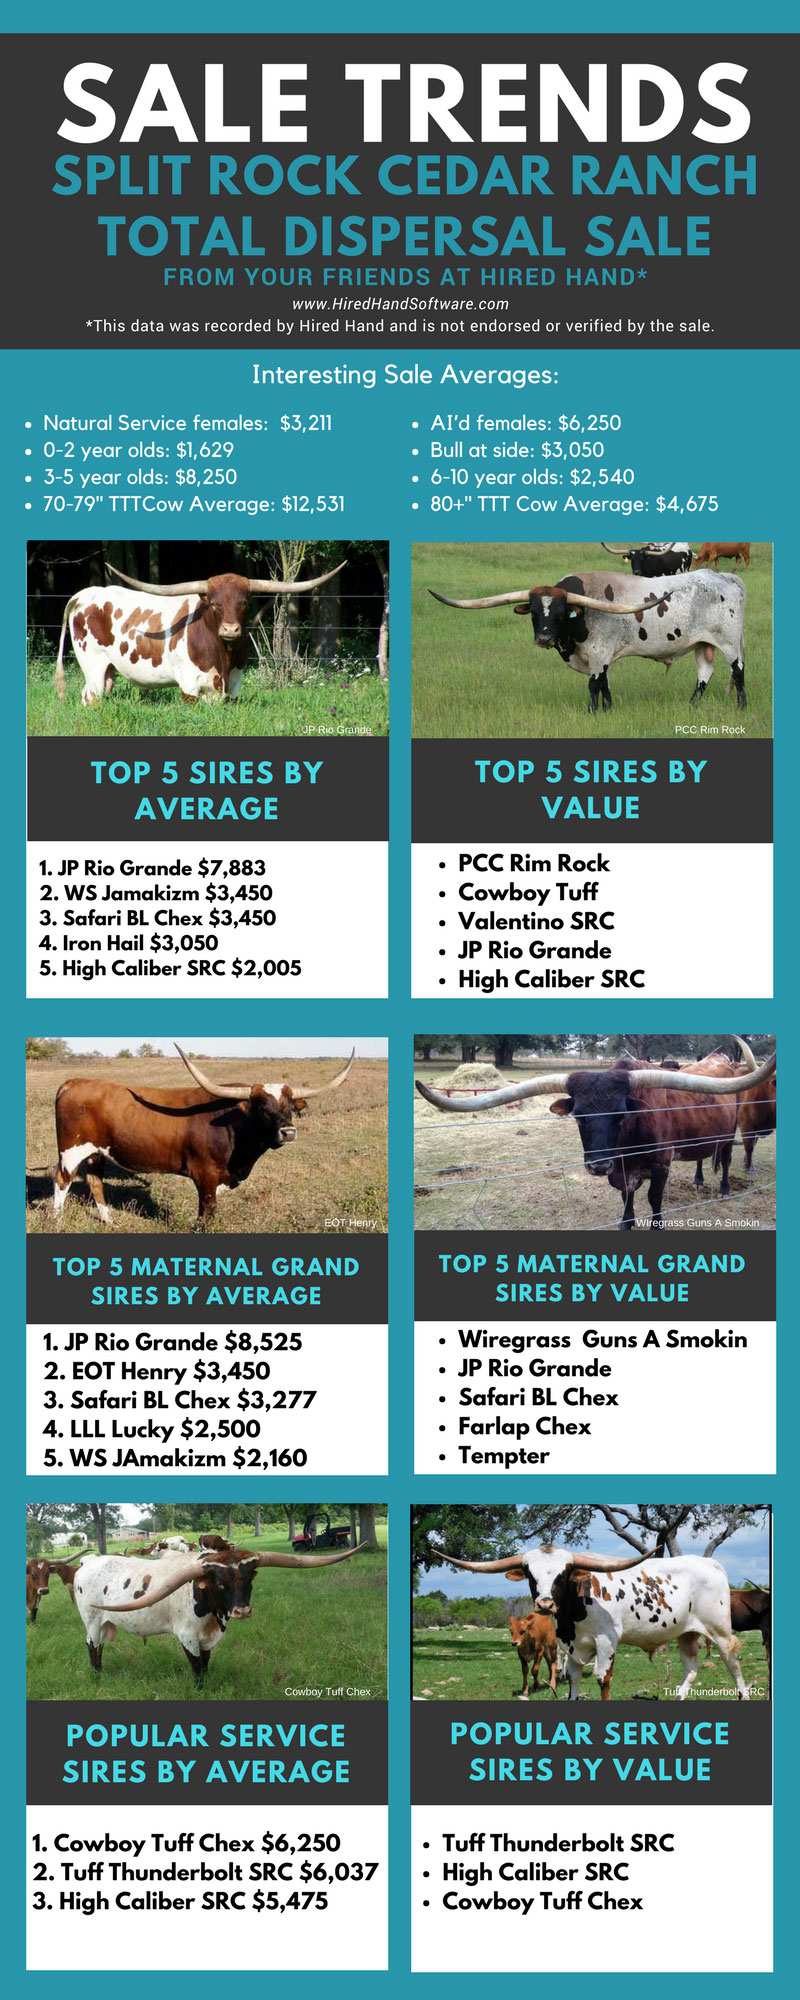 Split-Rock-Cedar-Ranch-Total-Dispersal-Sale-Trends-&-Averages